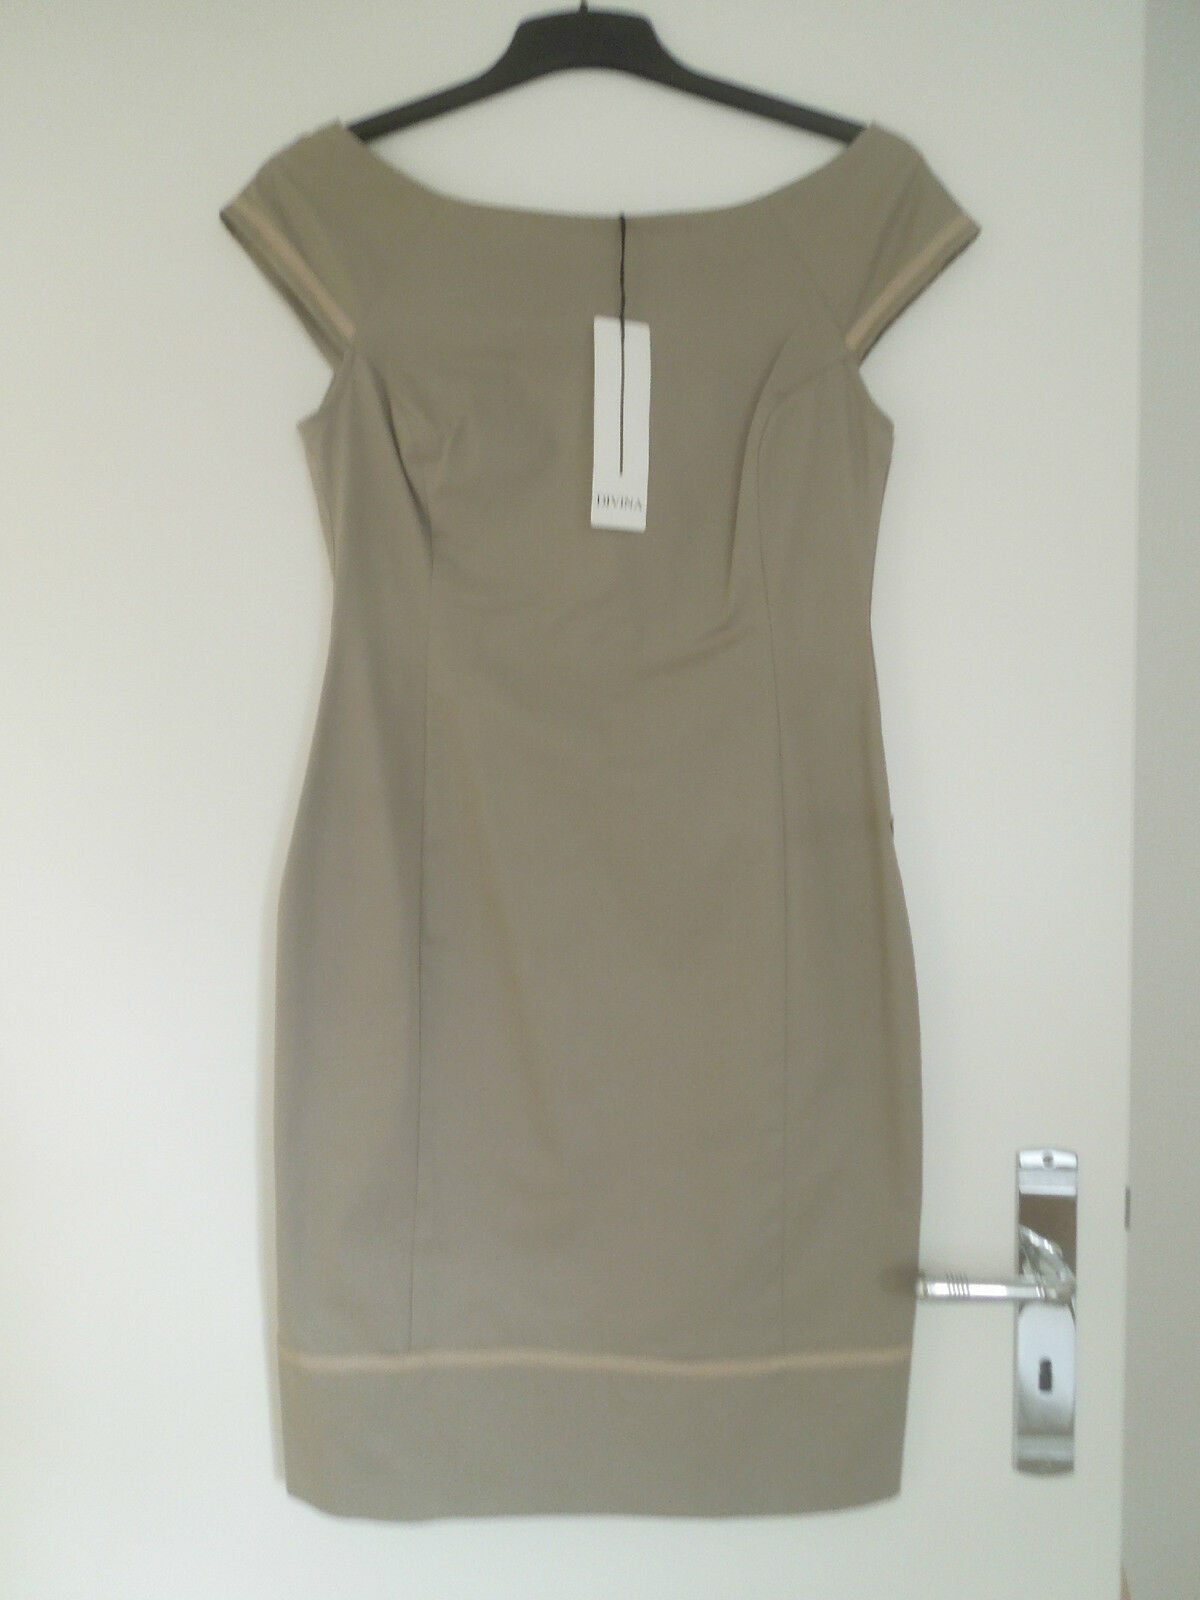 DIVINA - Italienischer Designer  - Kleid - taupe -  398 00 - Neu